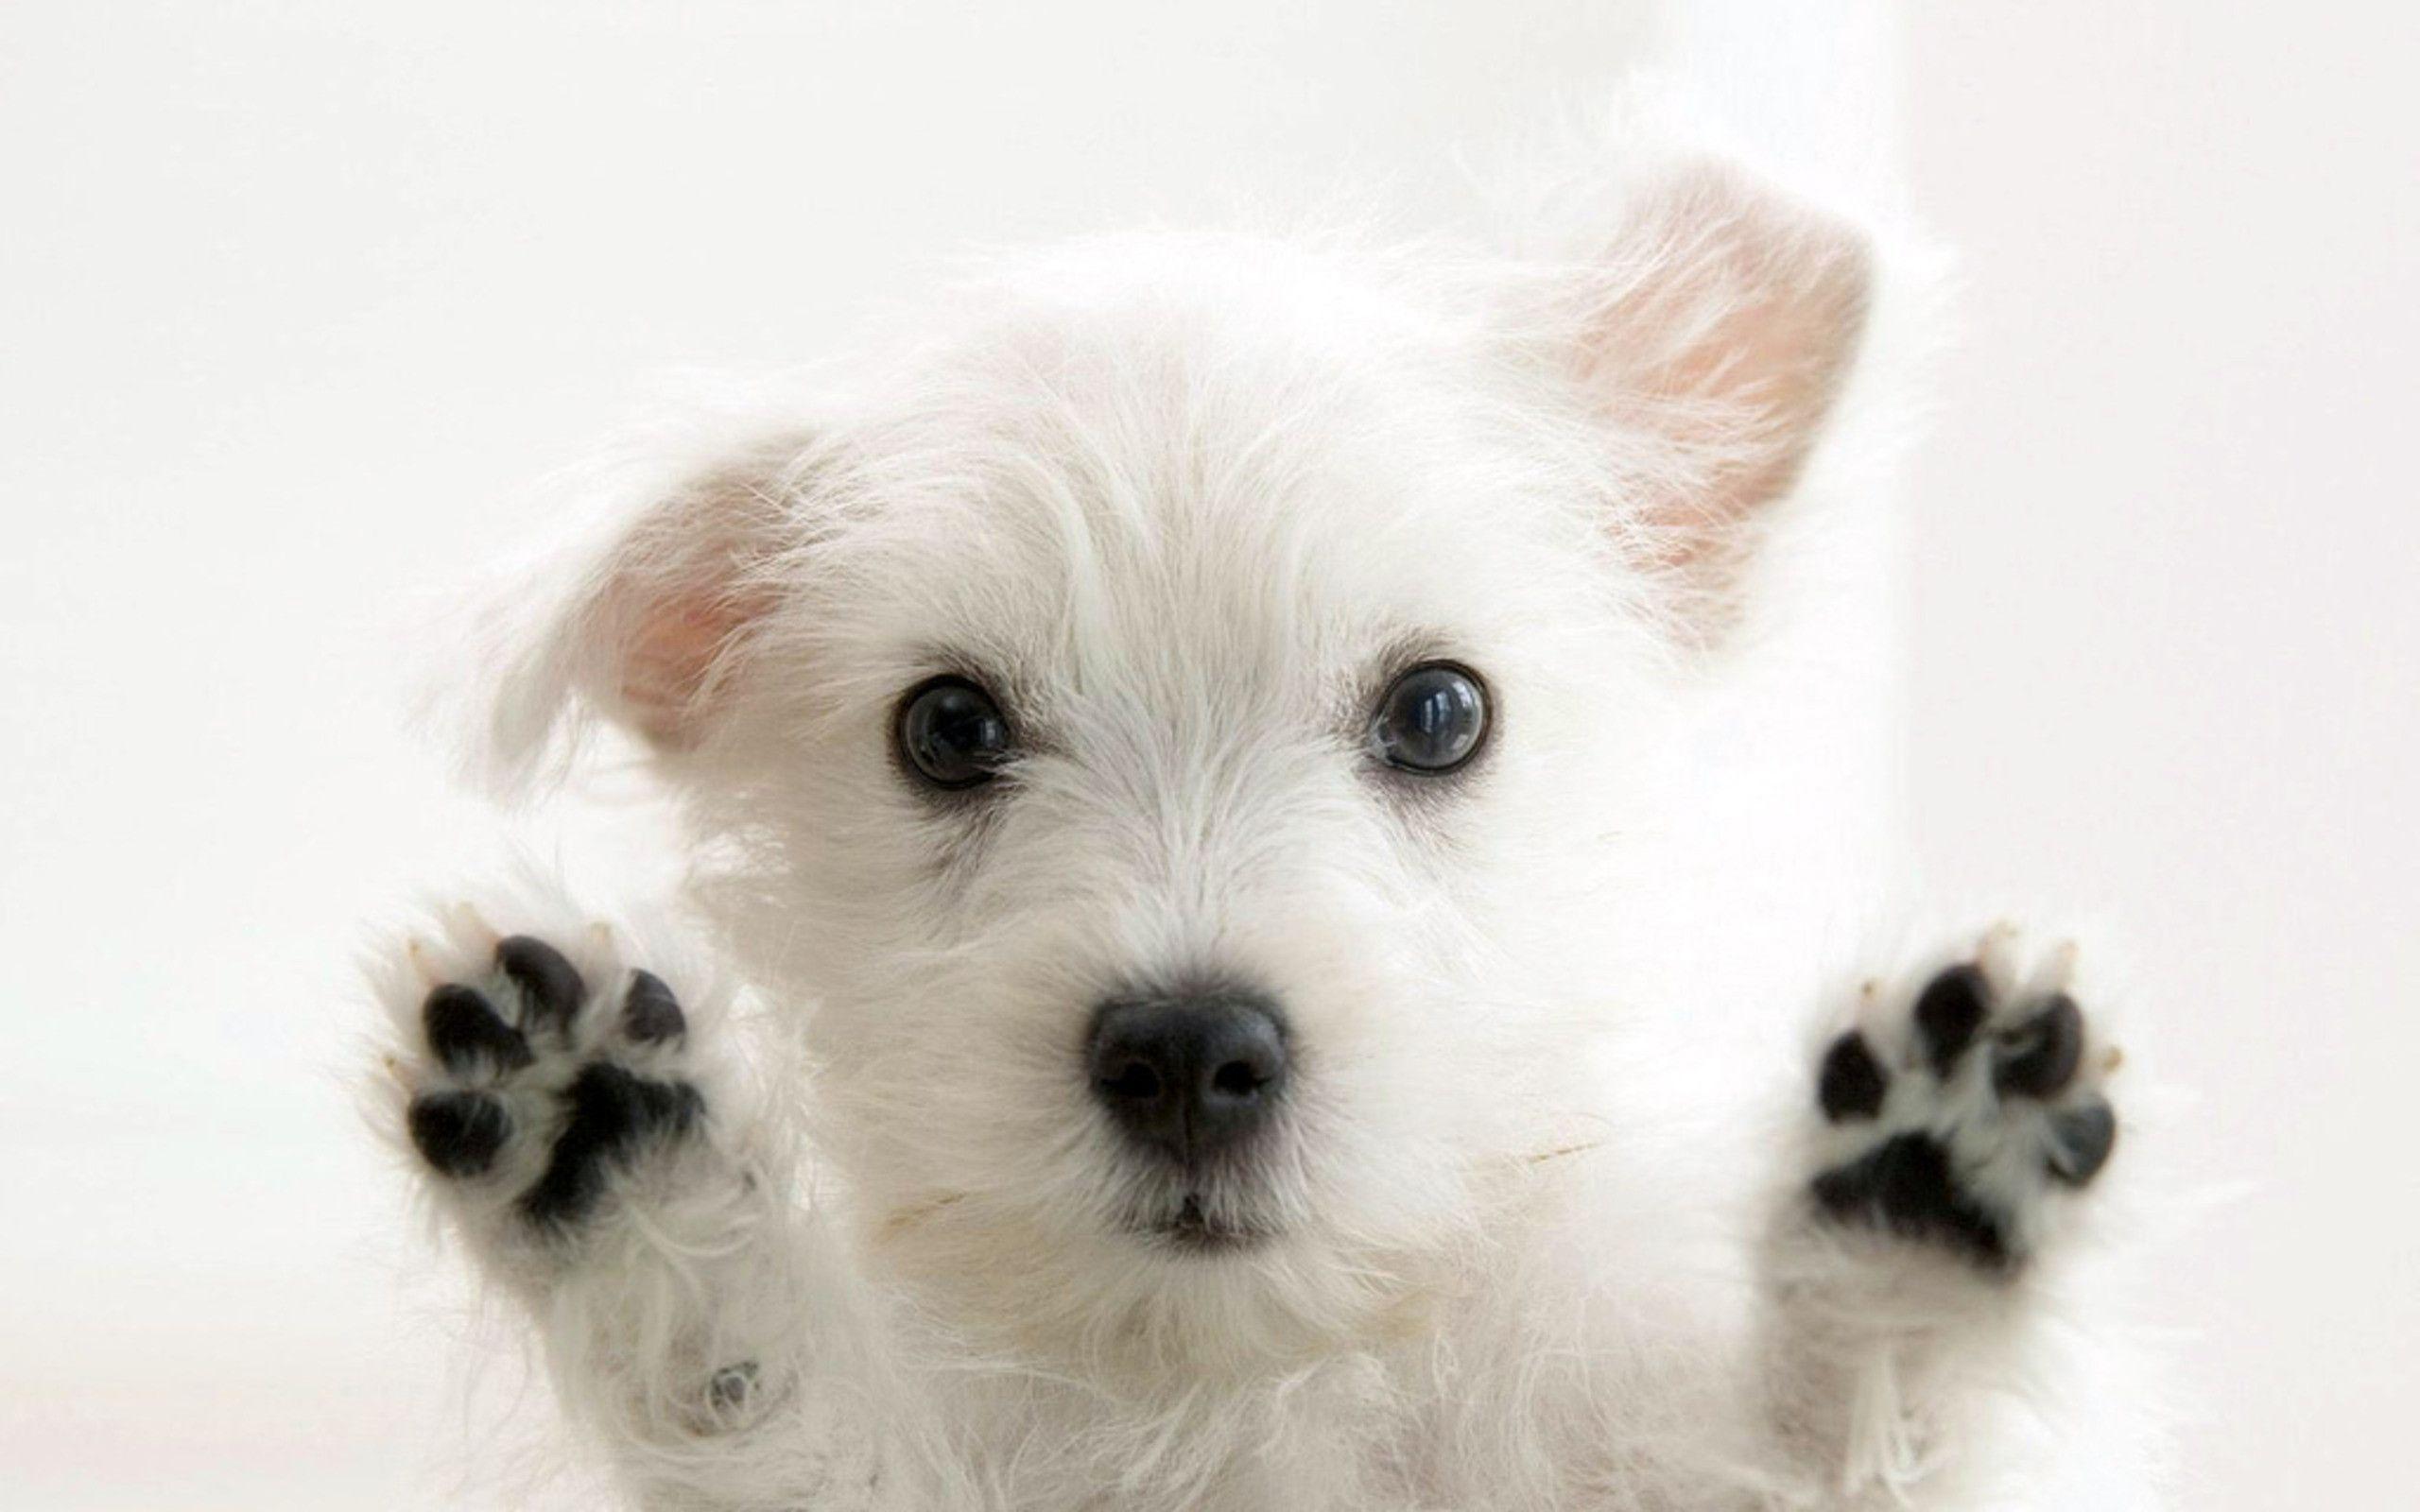 Puppy wallpaper - SF Wallpaper